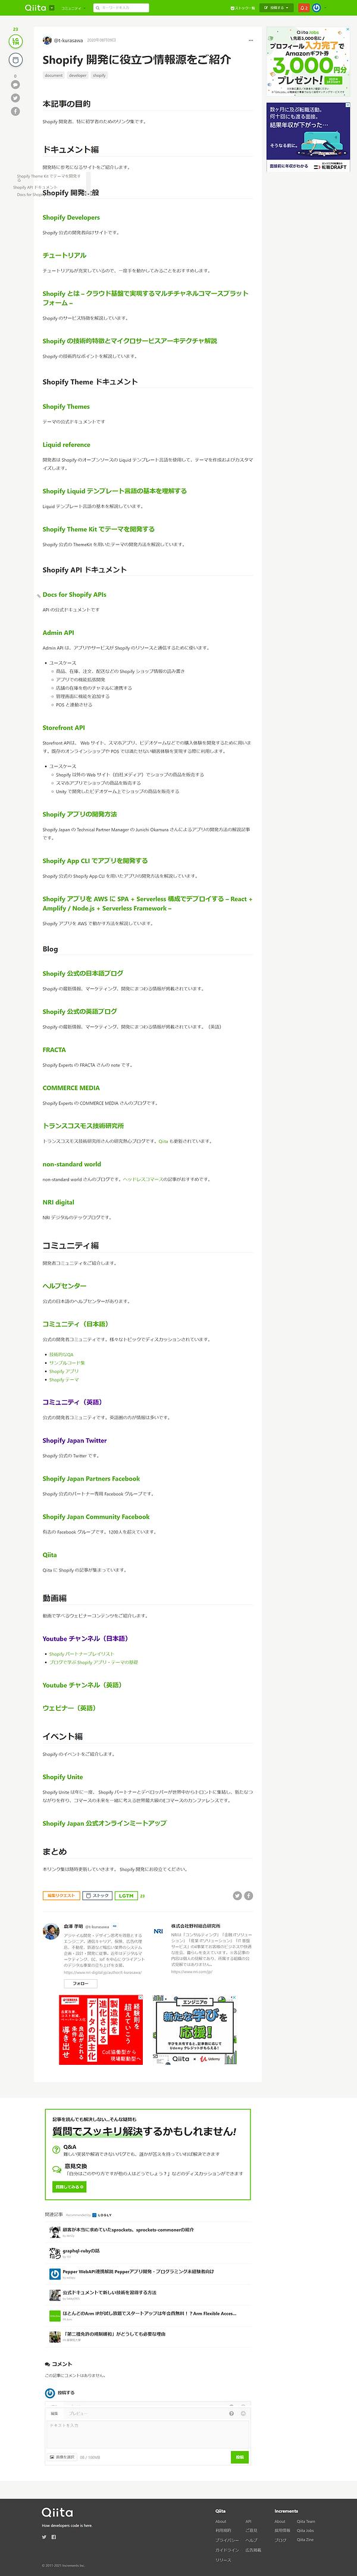 Screenshot - 2021-01-17T234704.611.png